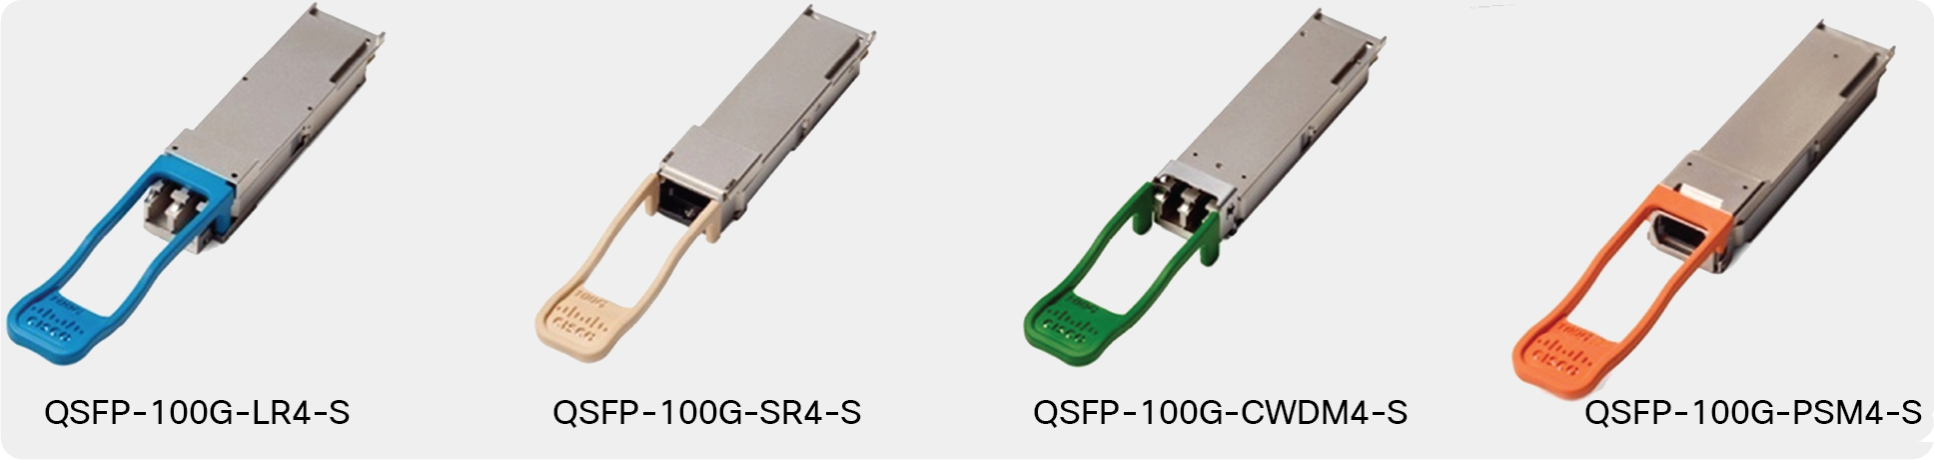 100G CR4 Passive 3m DAC QSFP-100G-CU3M-HPC Cisco Compatible QSFP-100G-CU3M QSFP28 to QSFP28 3-Meter Twinax Cable